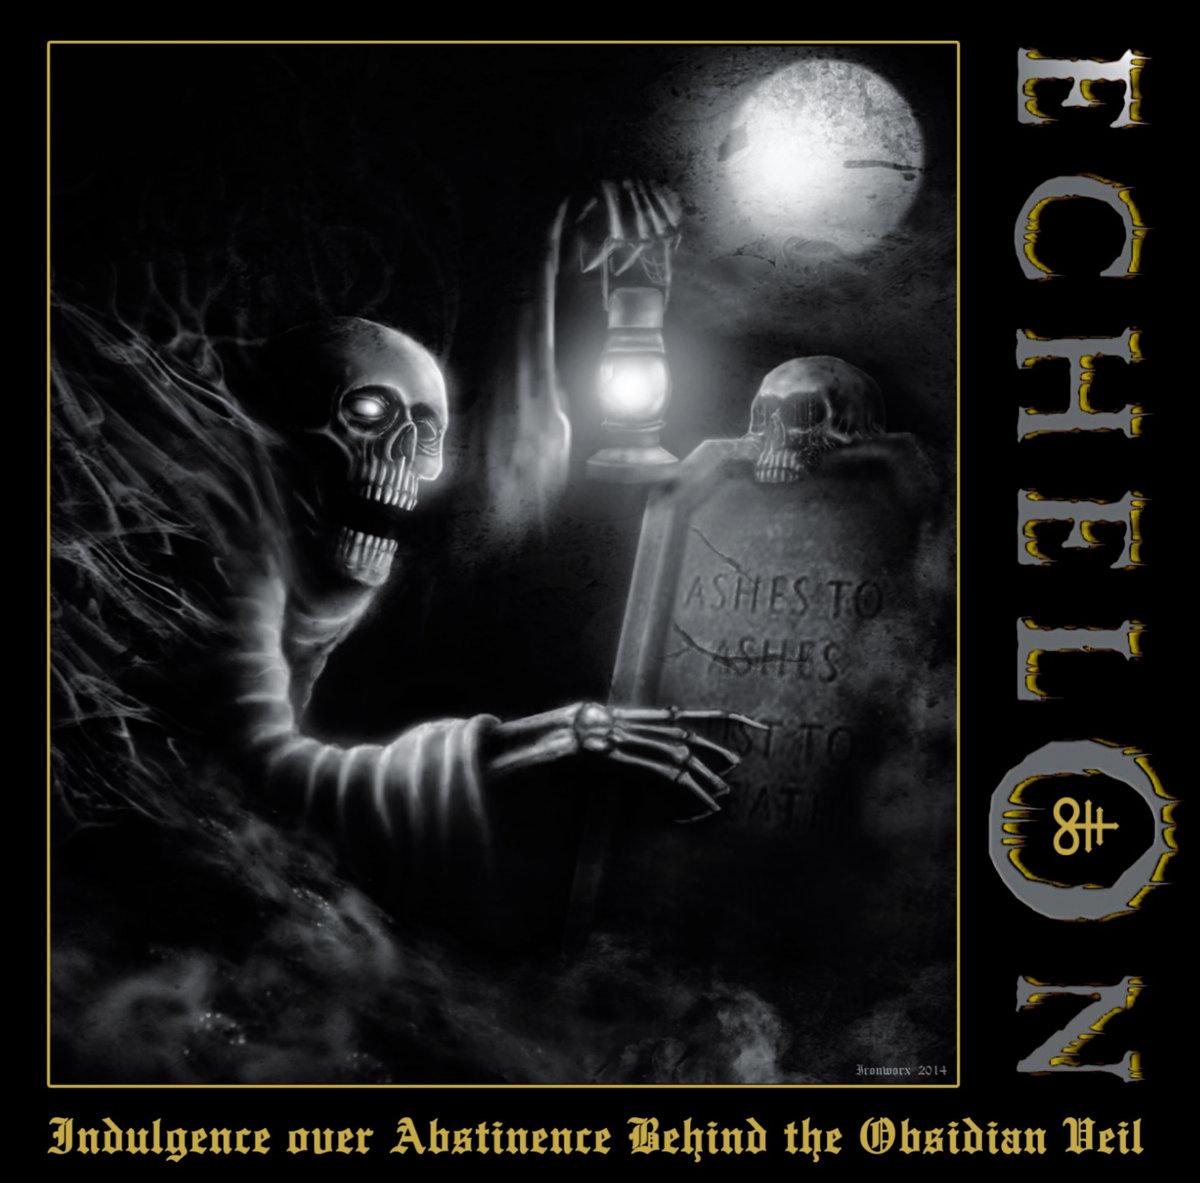 ECHELON - Indulgence Over Abstinence Behind The Obsidian Veil CD